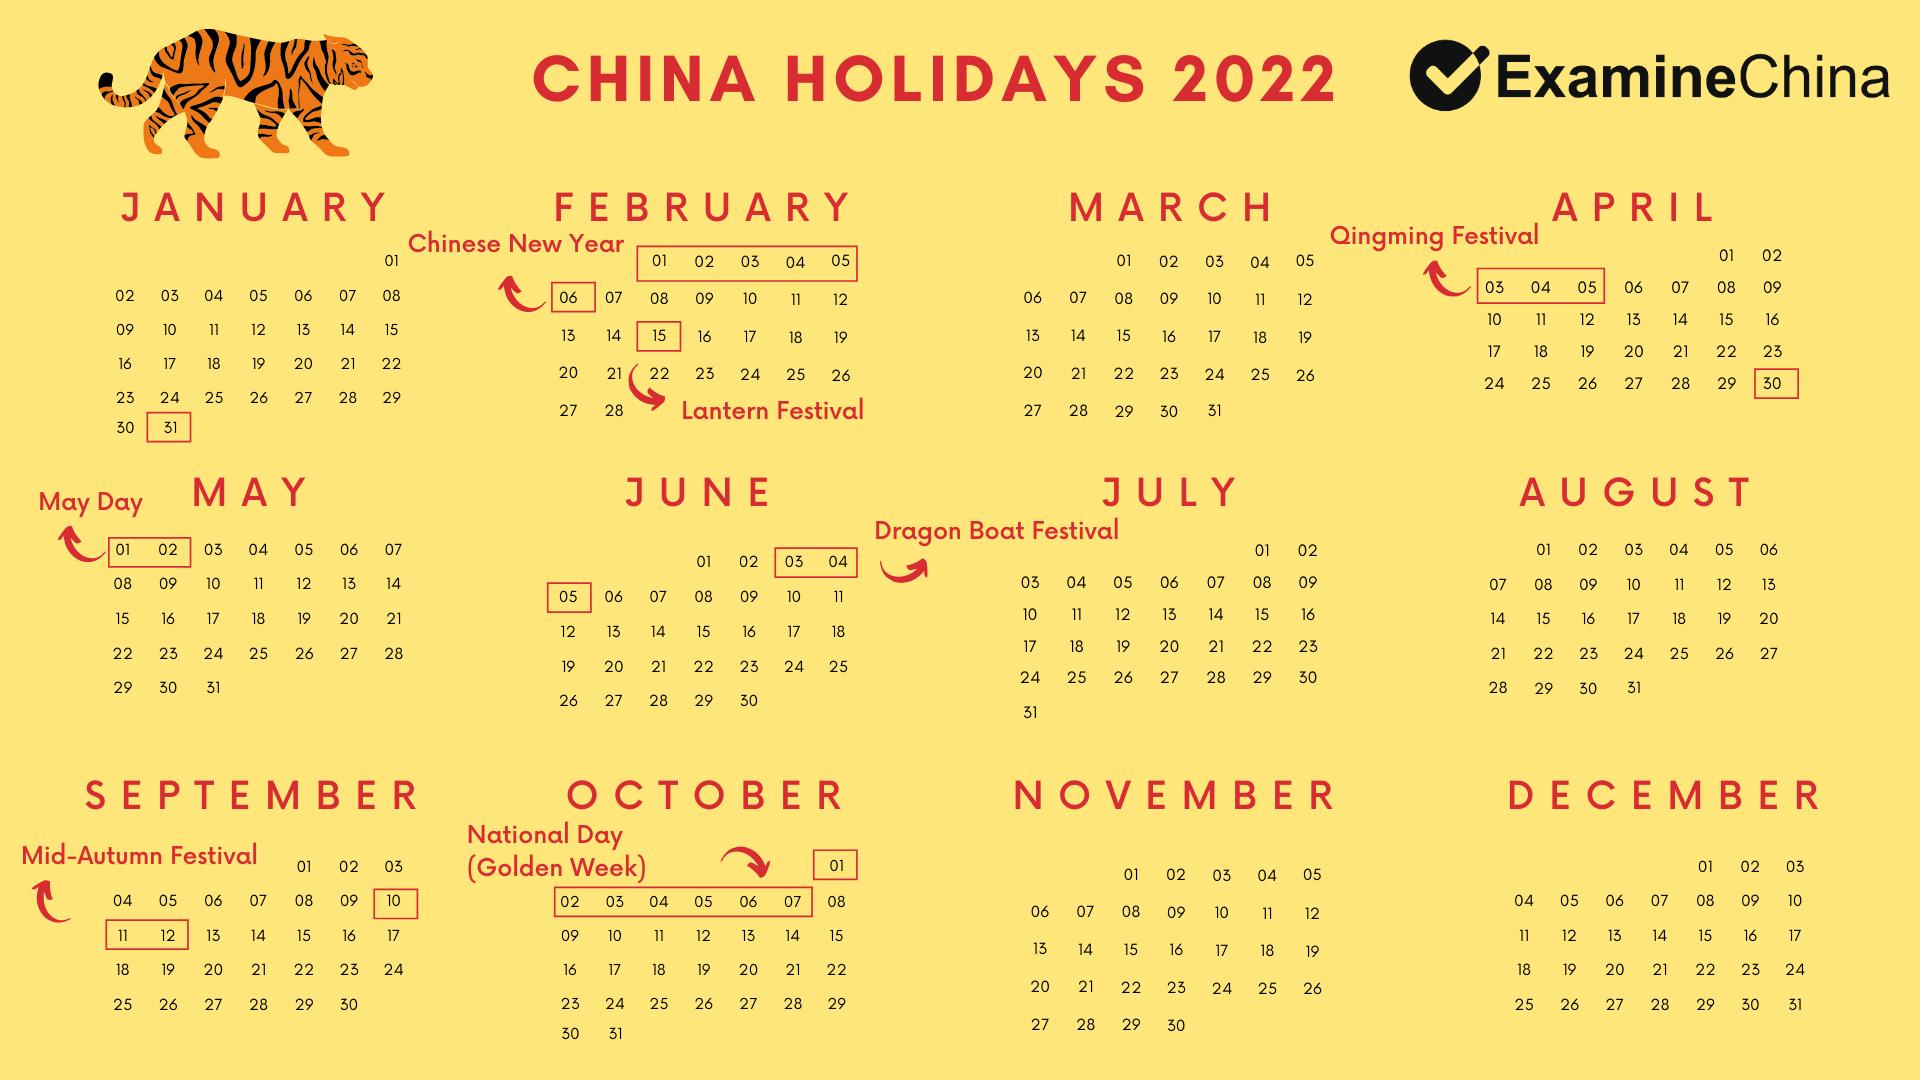 China Holidays 2022   ExamineChinacom Blog 1920x1080